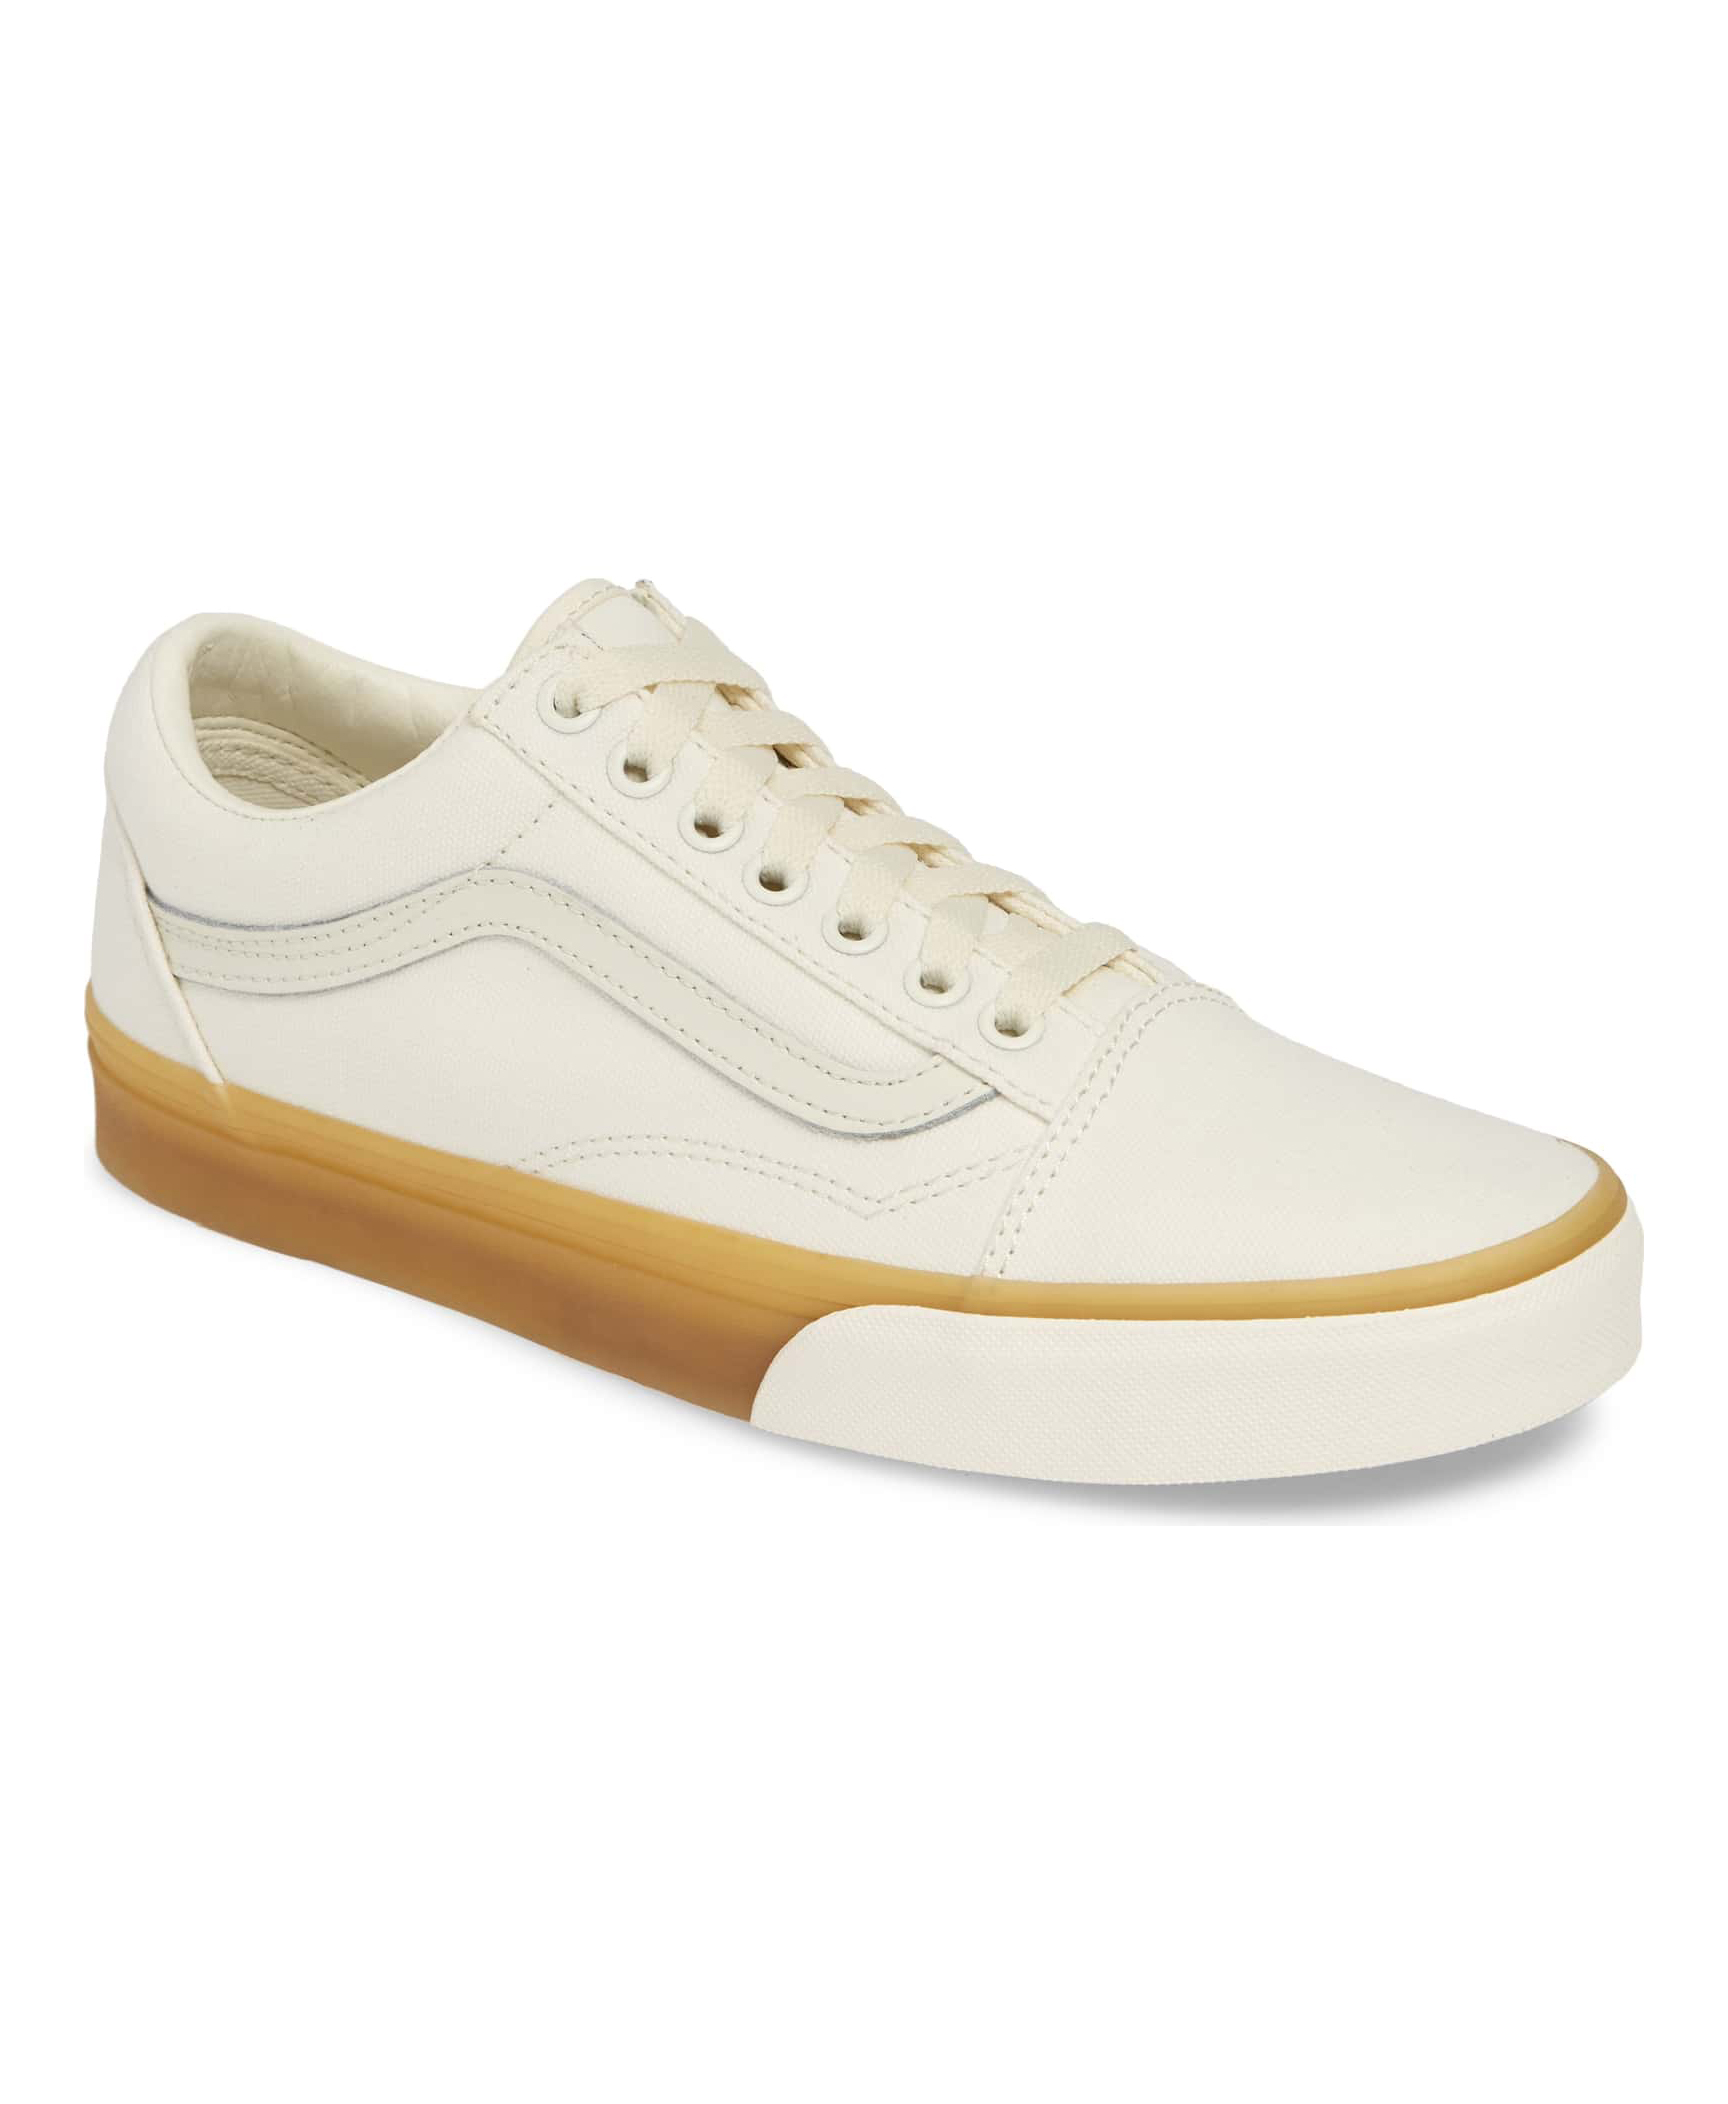 Marshmallow/Gumpop Shoe